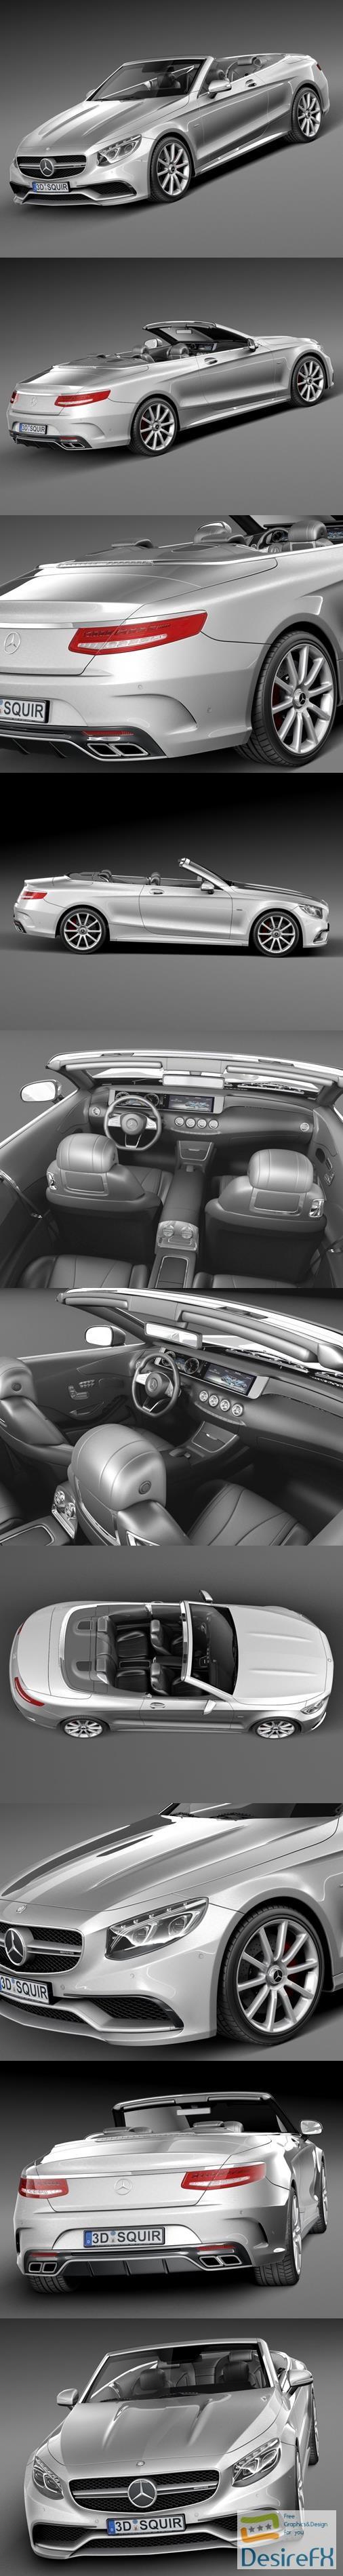 Mercedes-Benz S63 AMG Cabriolet 2017 3D Model